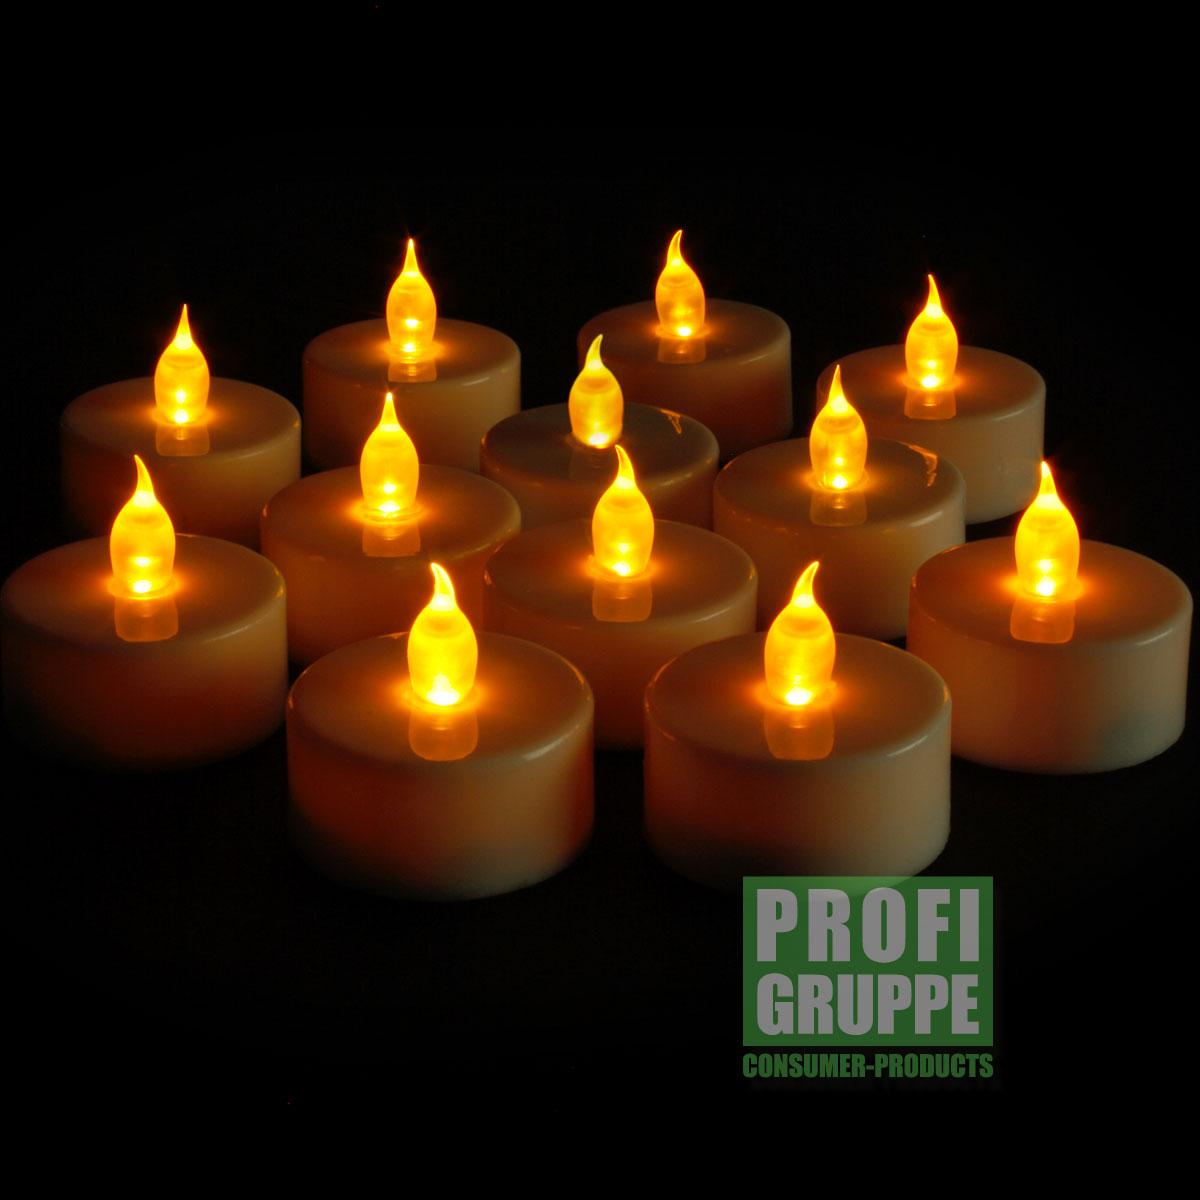 12-x-LED-Teelicht-flackernd-Teelichter-elektrische-Kerze-inkl-Batterien-Neu